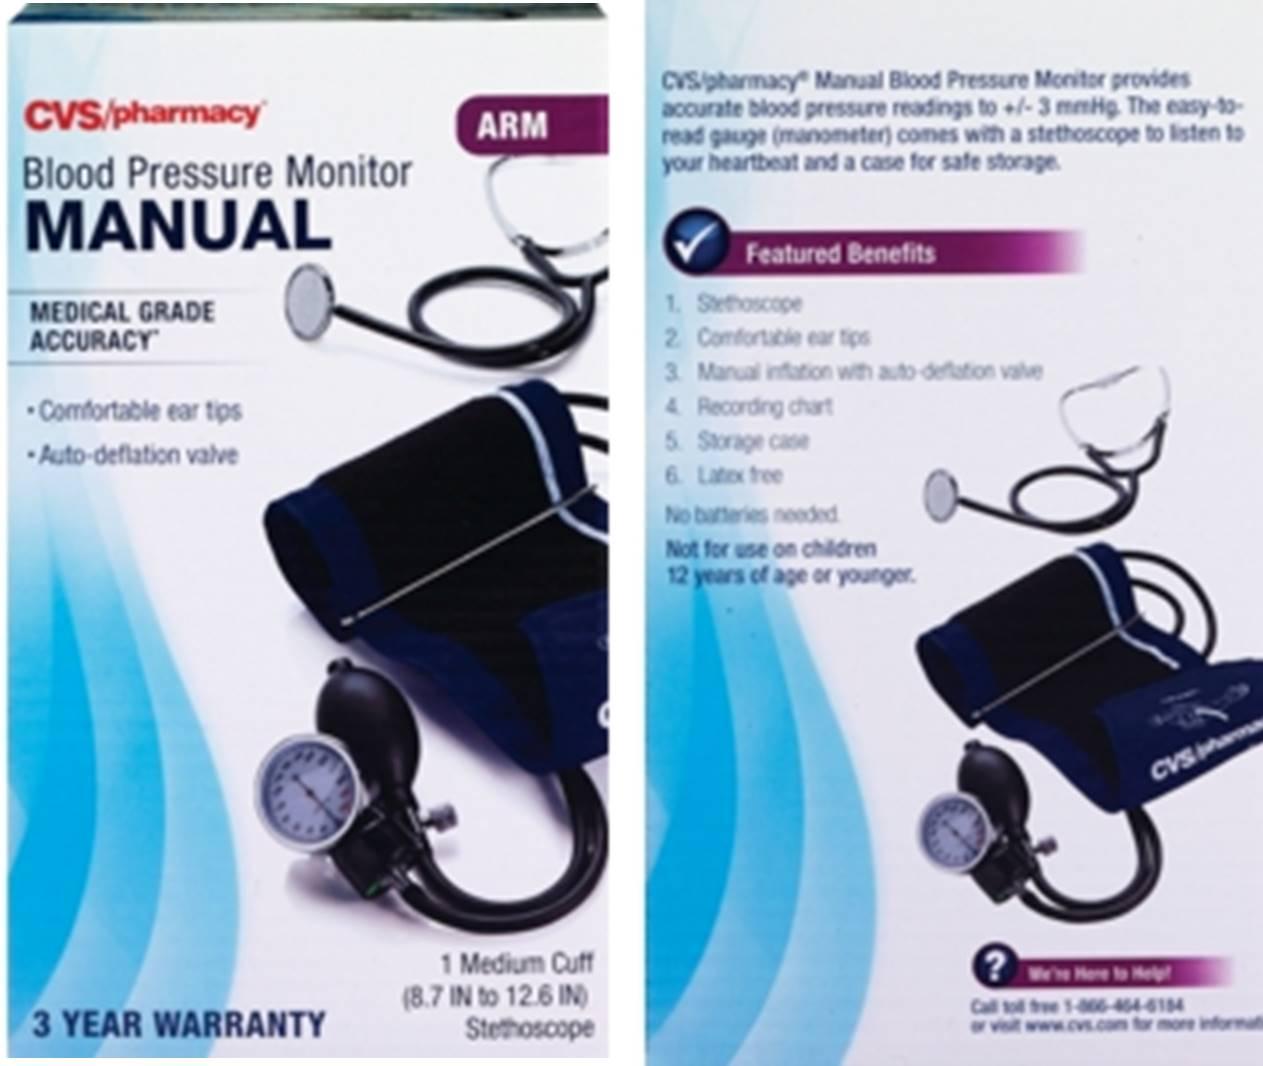 Vive Precision Blood Pressure Cuff Manual Guide